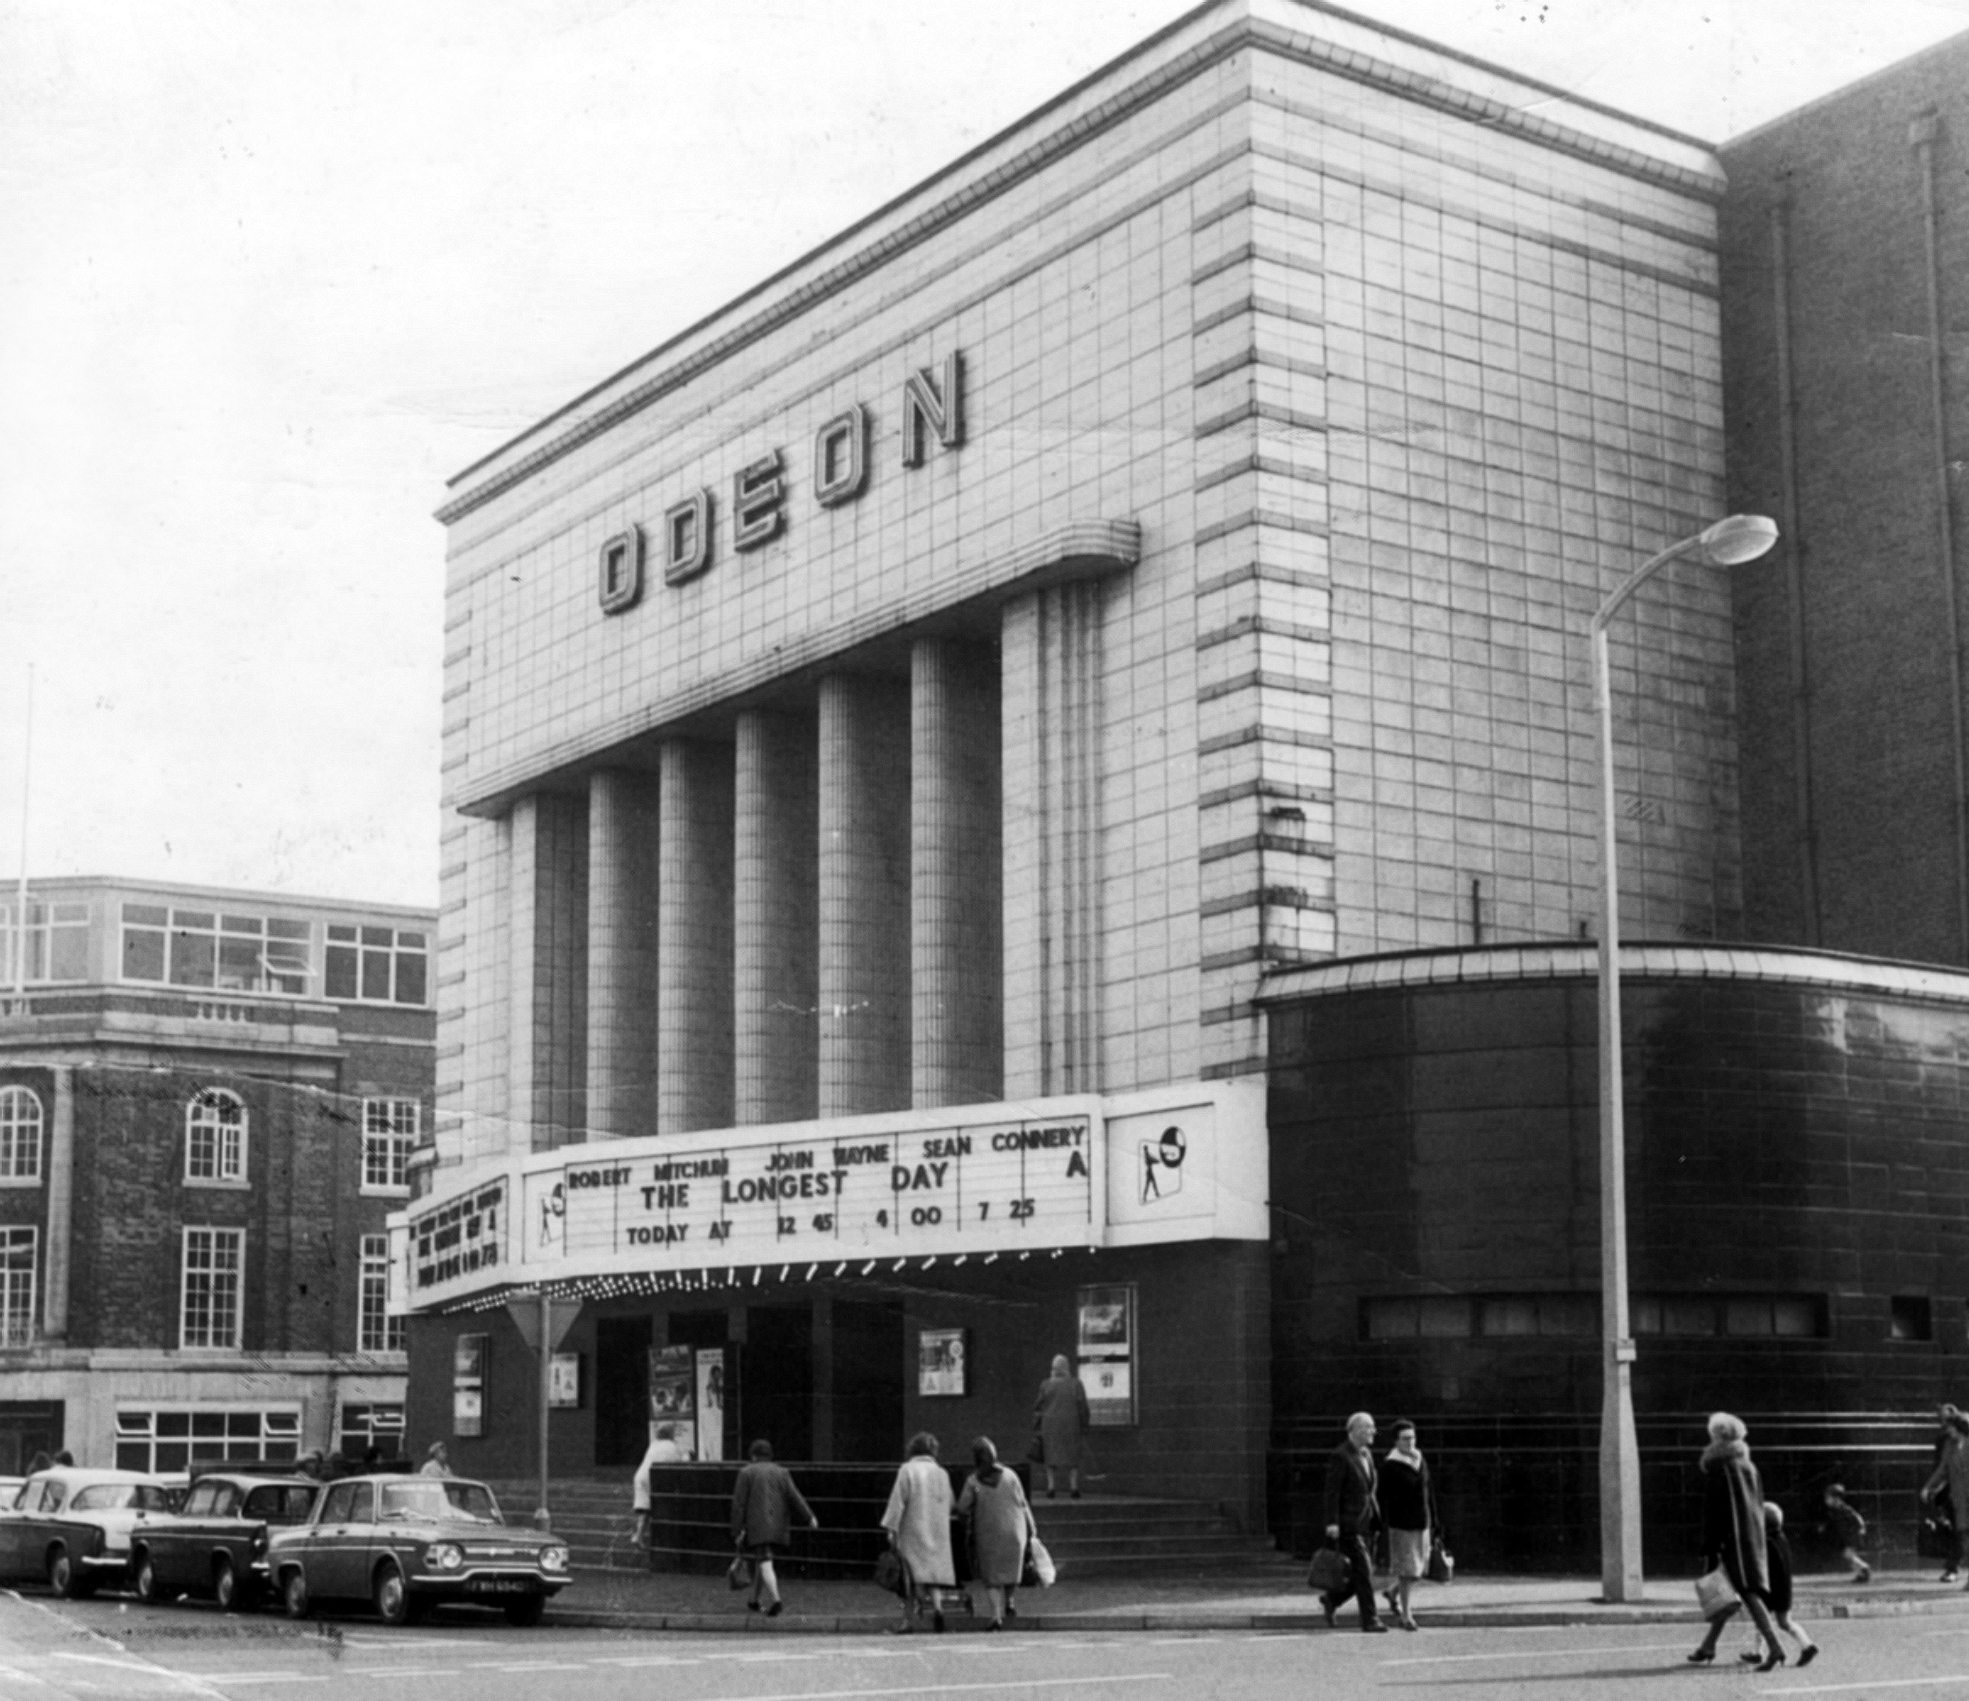 Bolton_Odeon